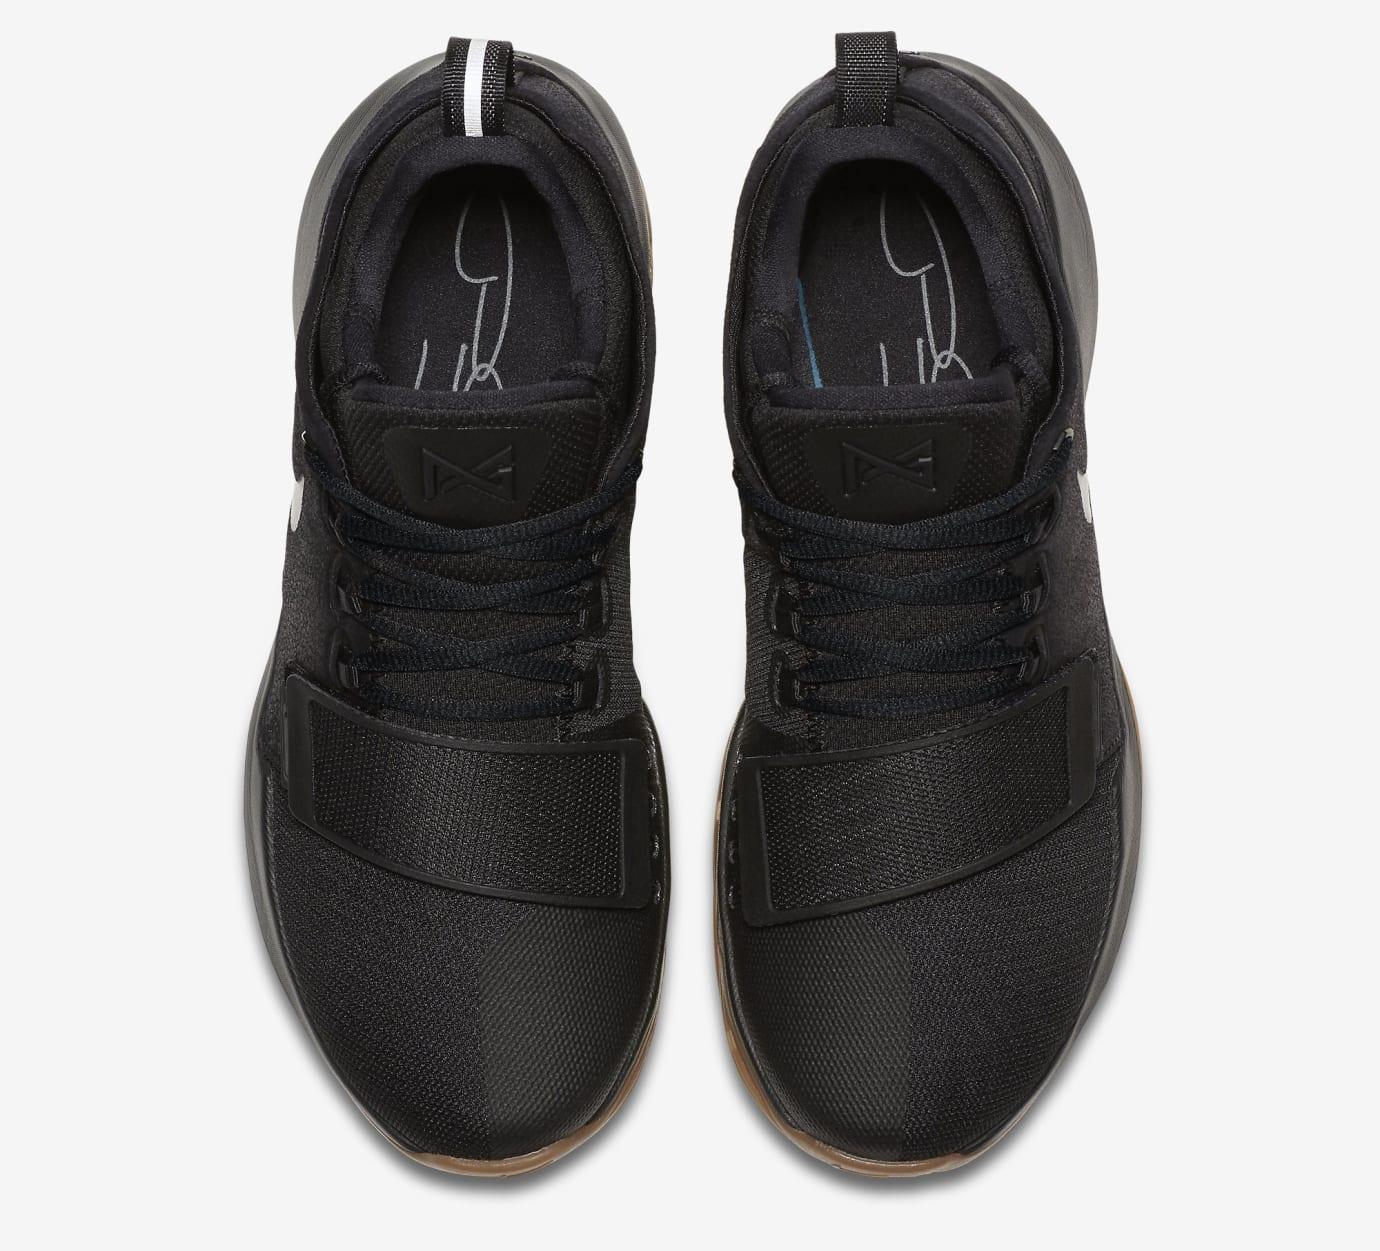 Nike PG1 Black Gum 878628-004 Top